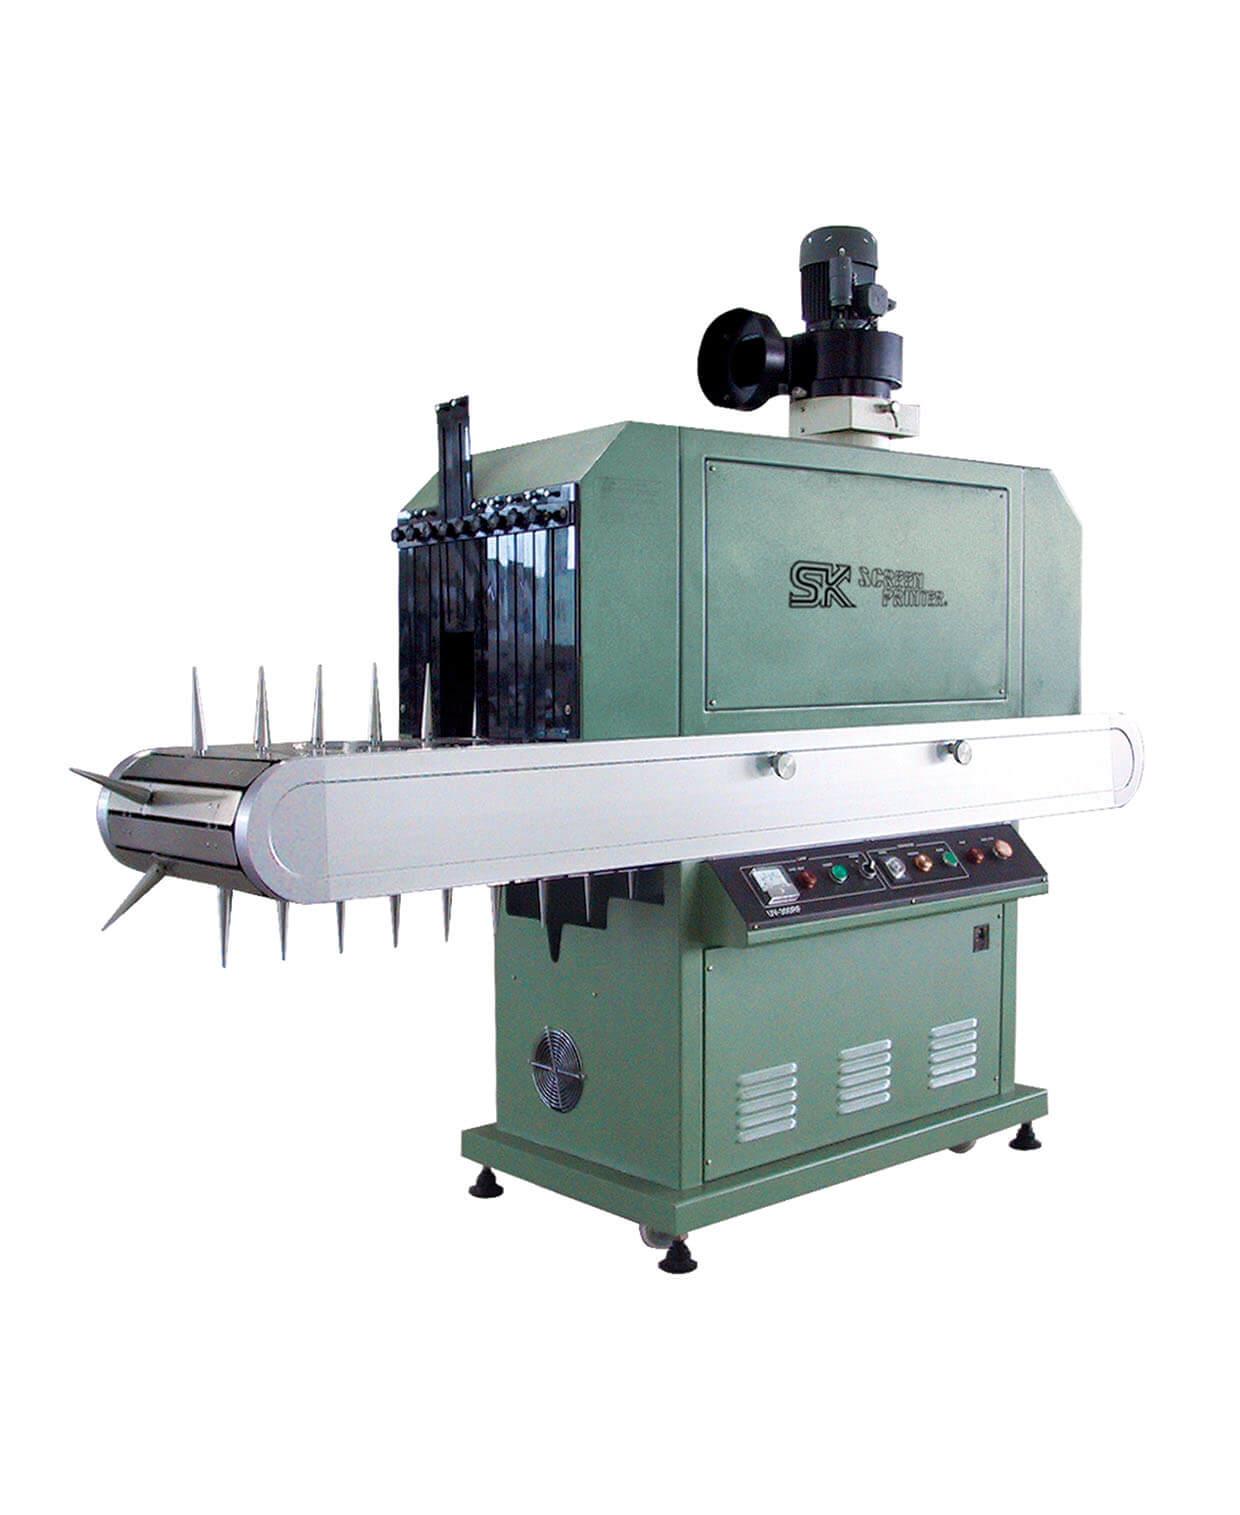 Uv Curing Machine : Uv rf flat round curing machine wutung holding co ltd